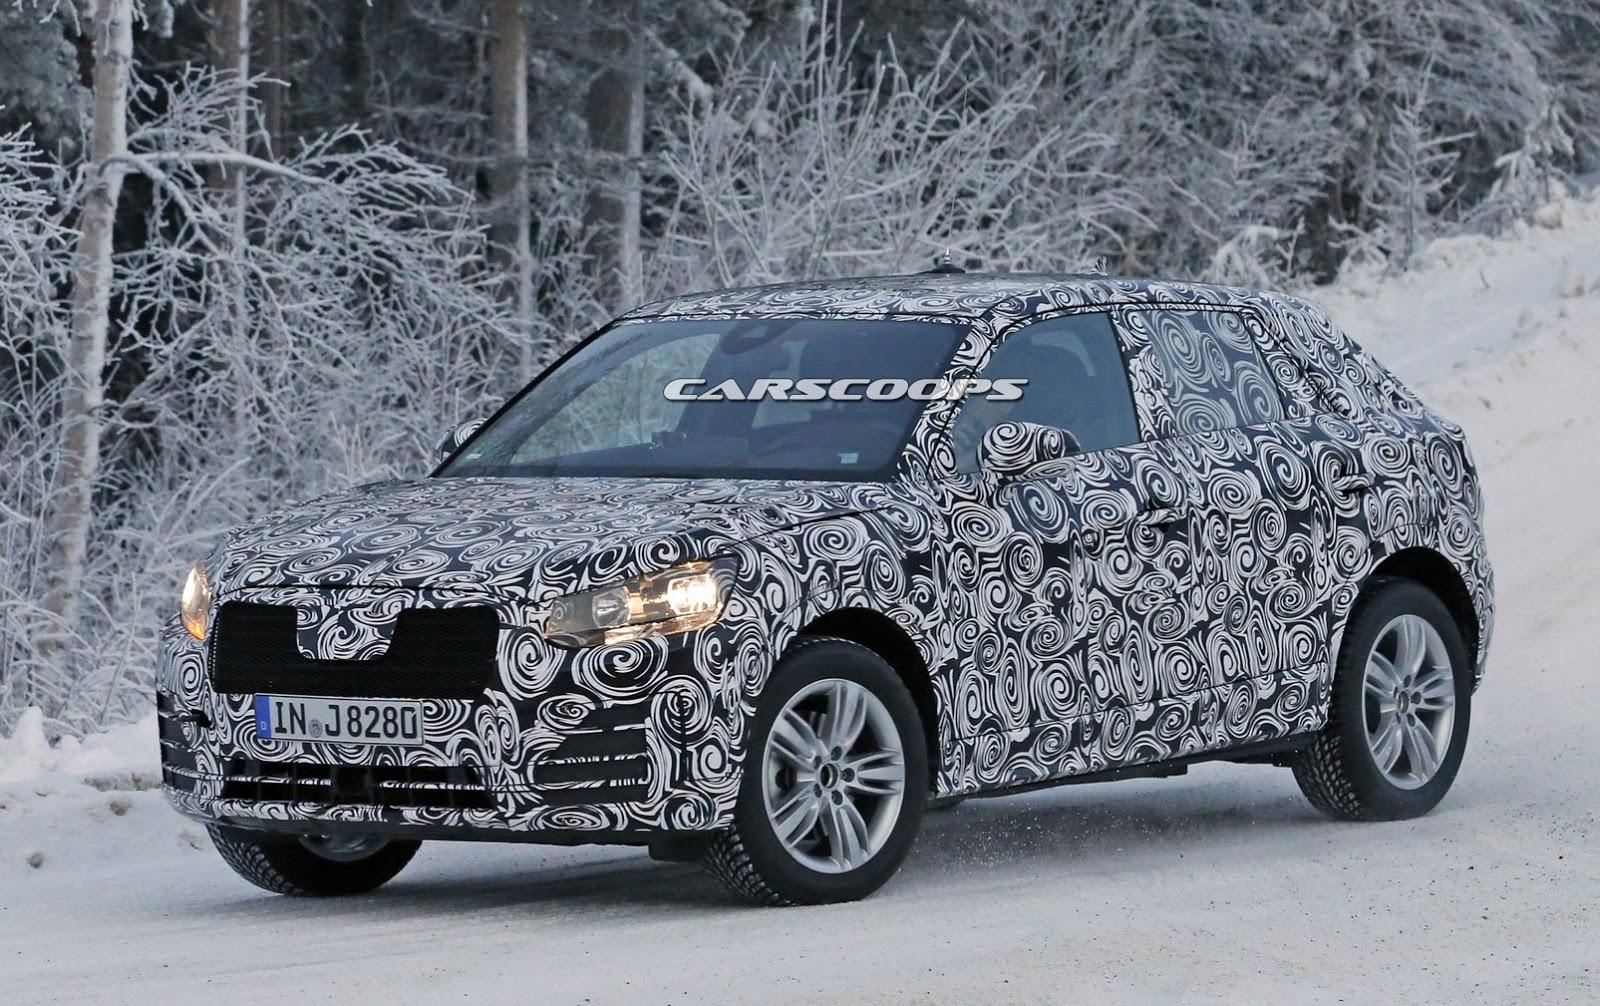 2018 Audi Q2 7 Η Alfa Romeo δίνει τα ονόματα Q2 και Q4 στην Audi και παίρνει το Bora;